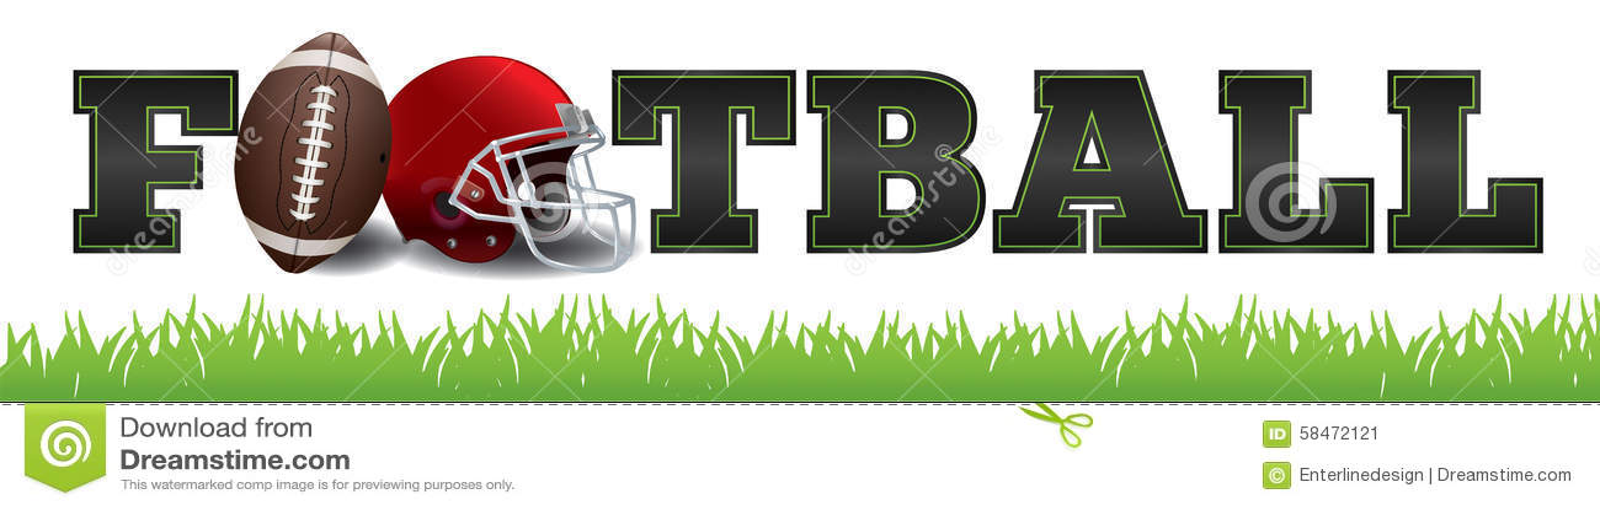 American Football Word Art Illustration Stock Vector